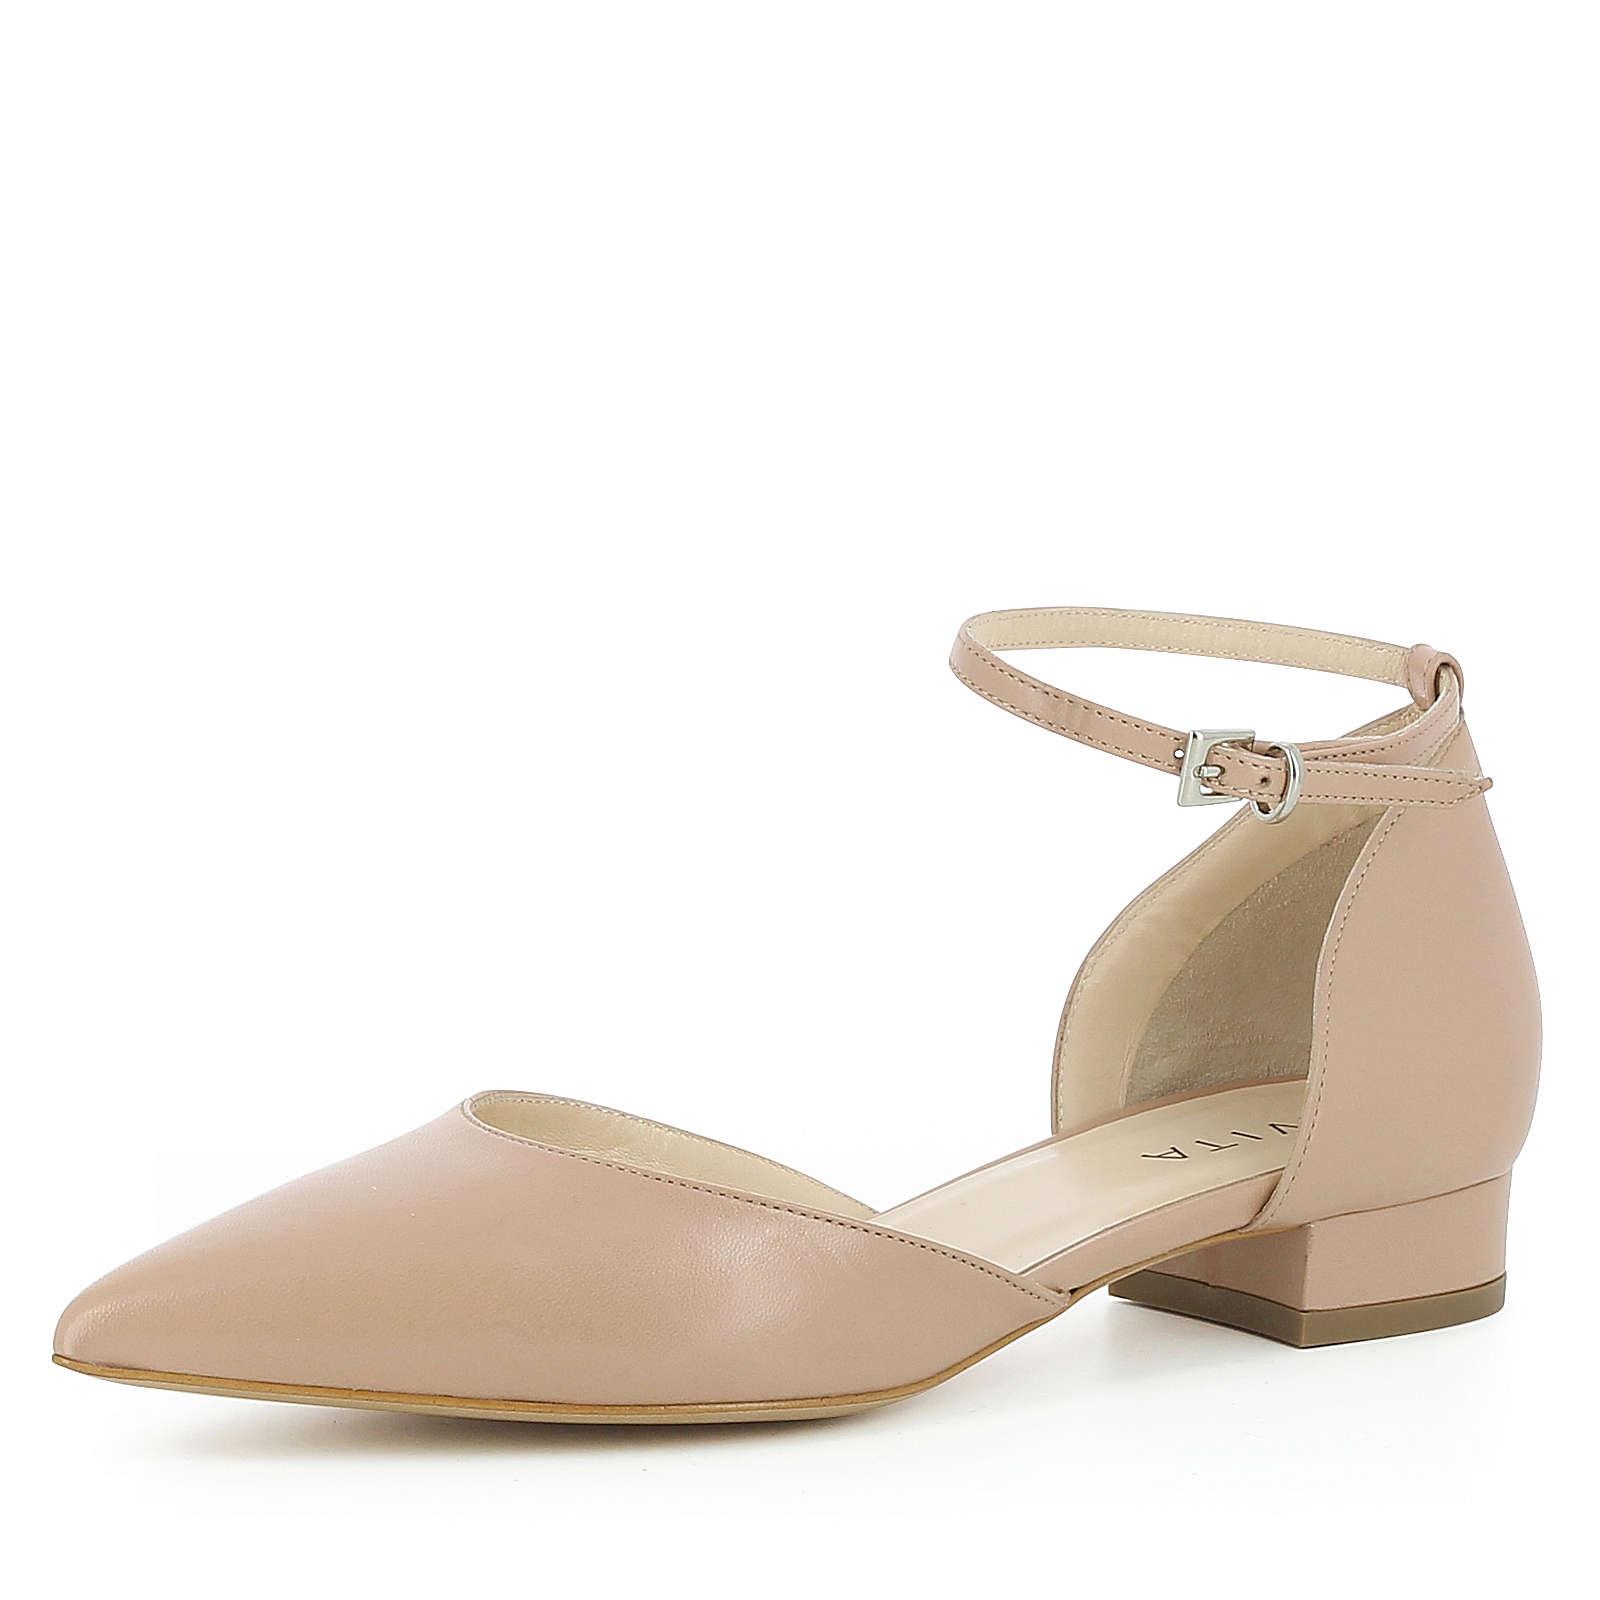 Evita Shoes Damen Pumps halboffen FRANCA Komfort-Pumps nude Damen Gr. 39